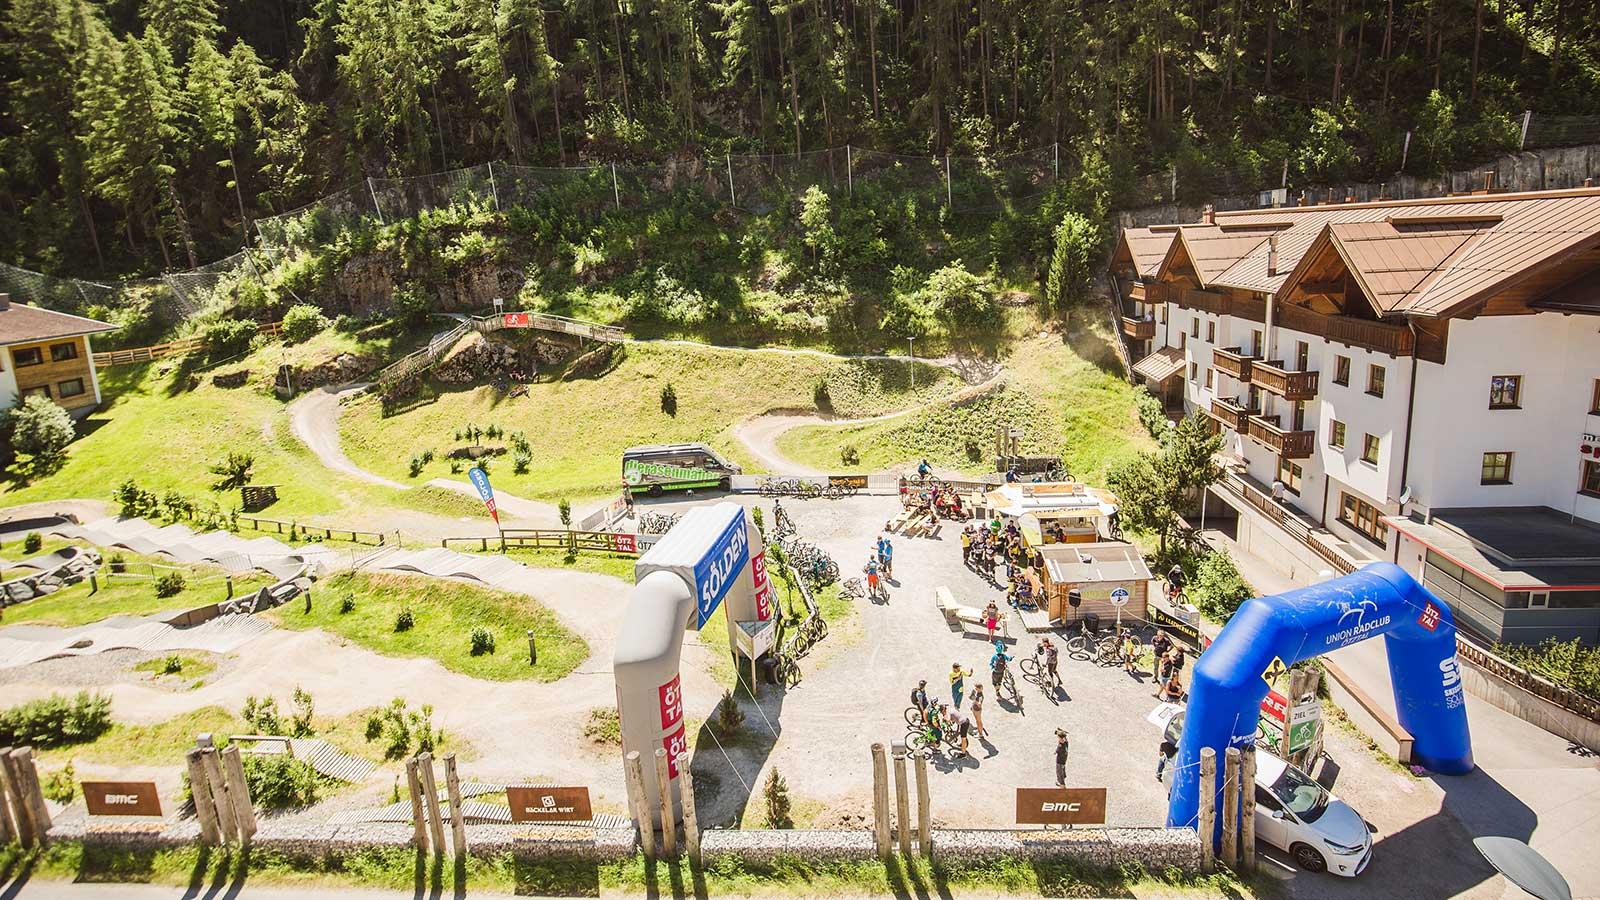 Event Schnitzeljagd 2018 - Expo Area